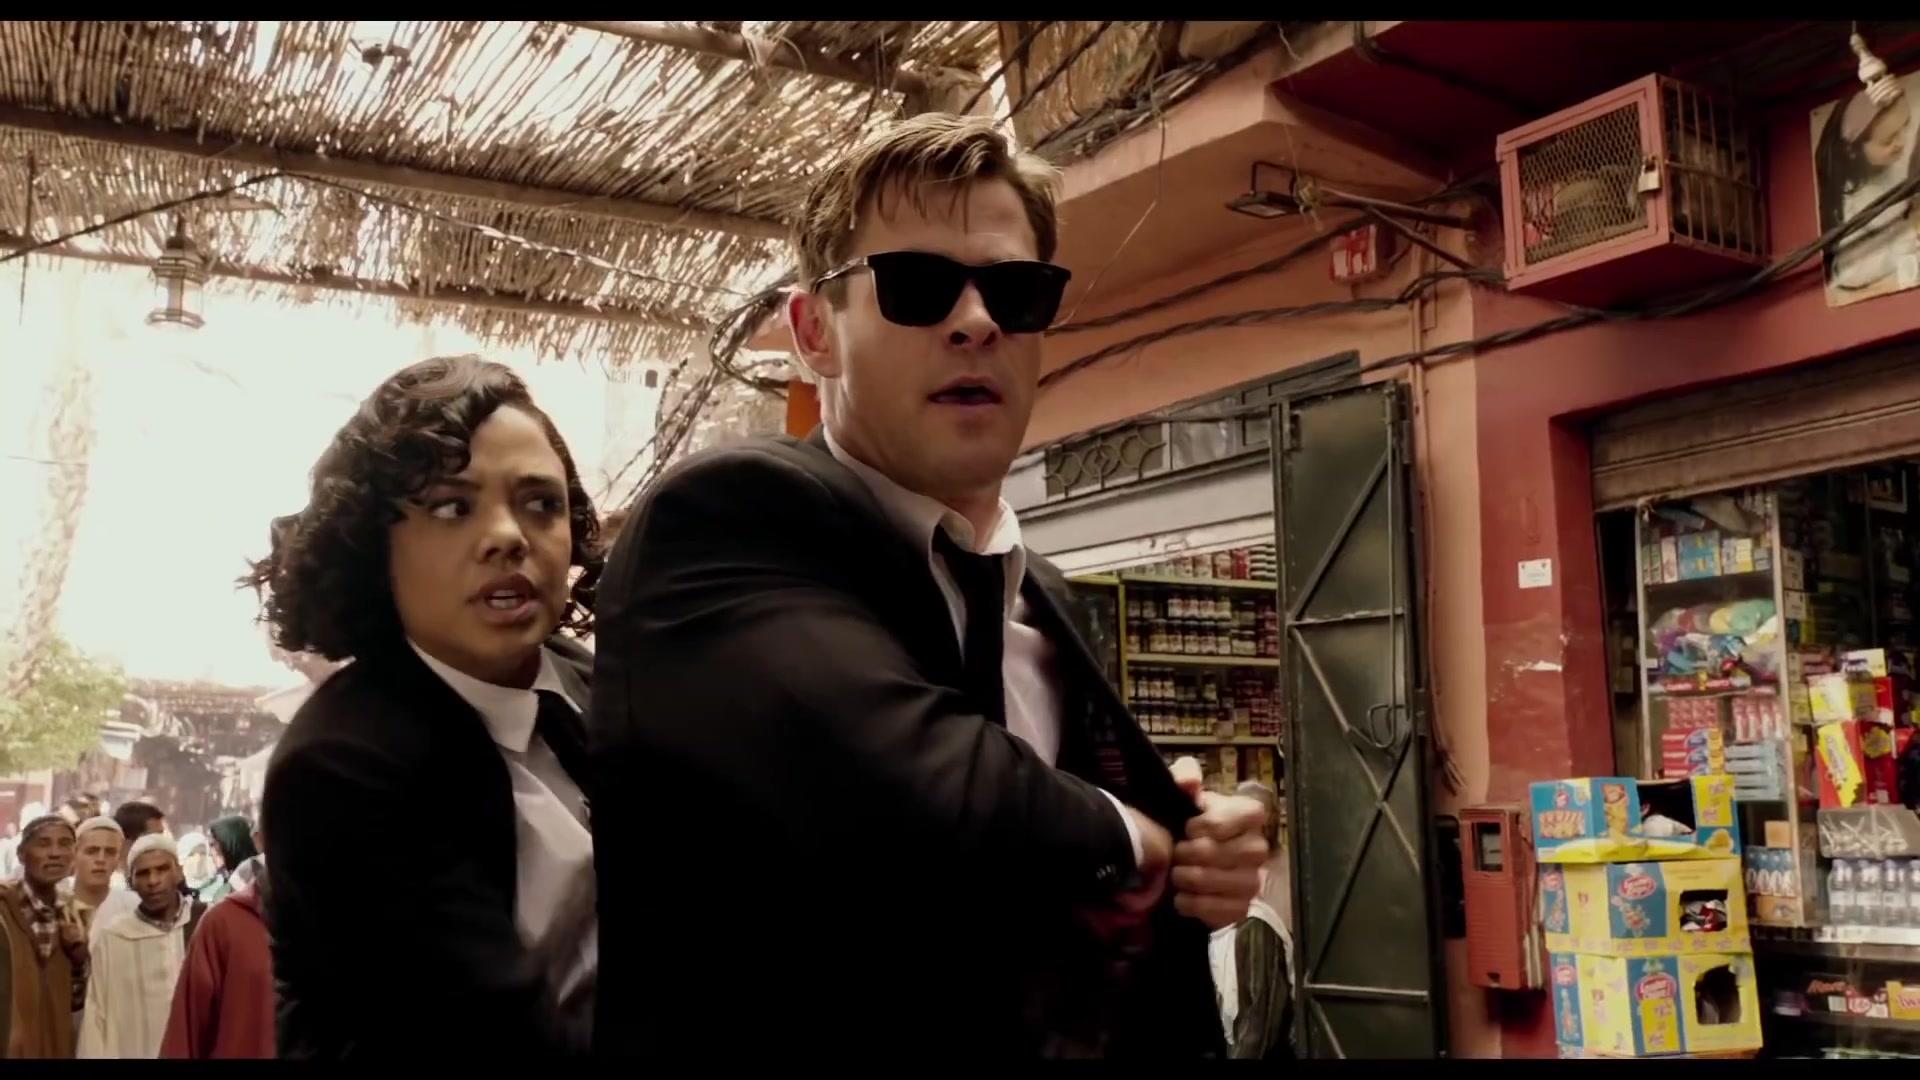 e40d2acc72c Police Sunglasses Worn by Chris Hemsworth in Men in Black  International ( 2019) Movie